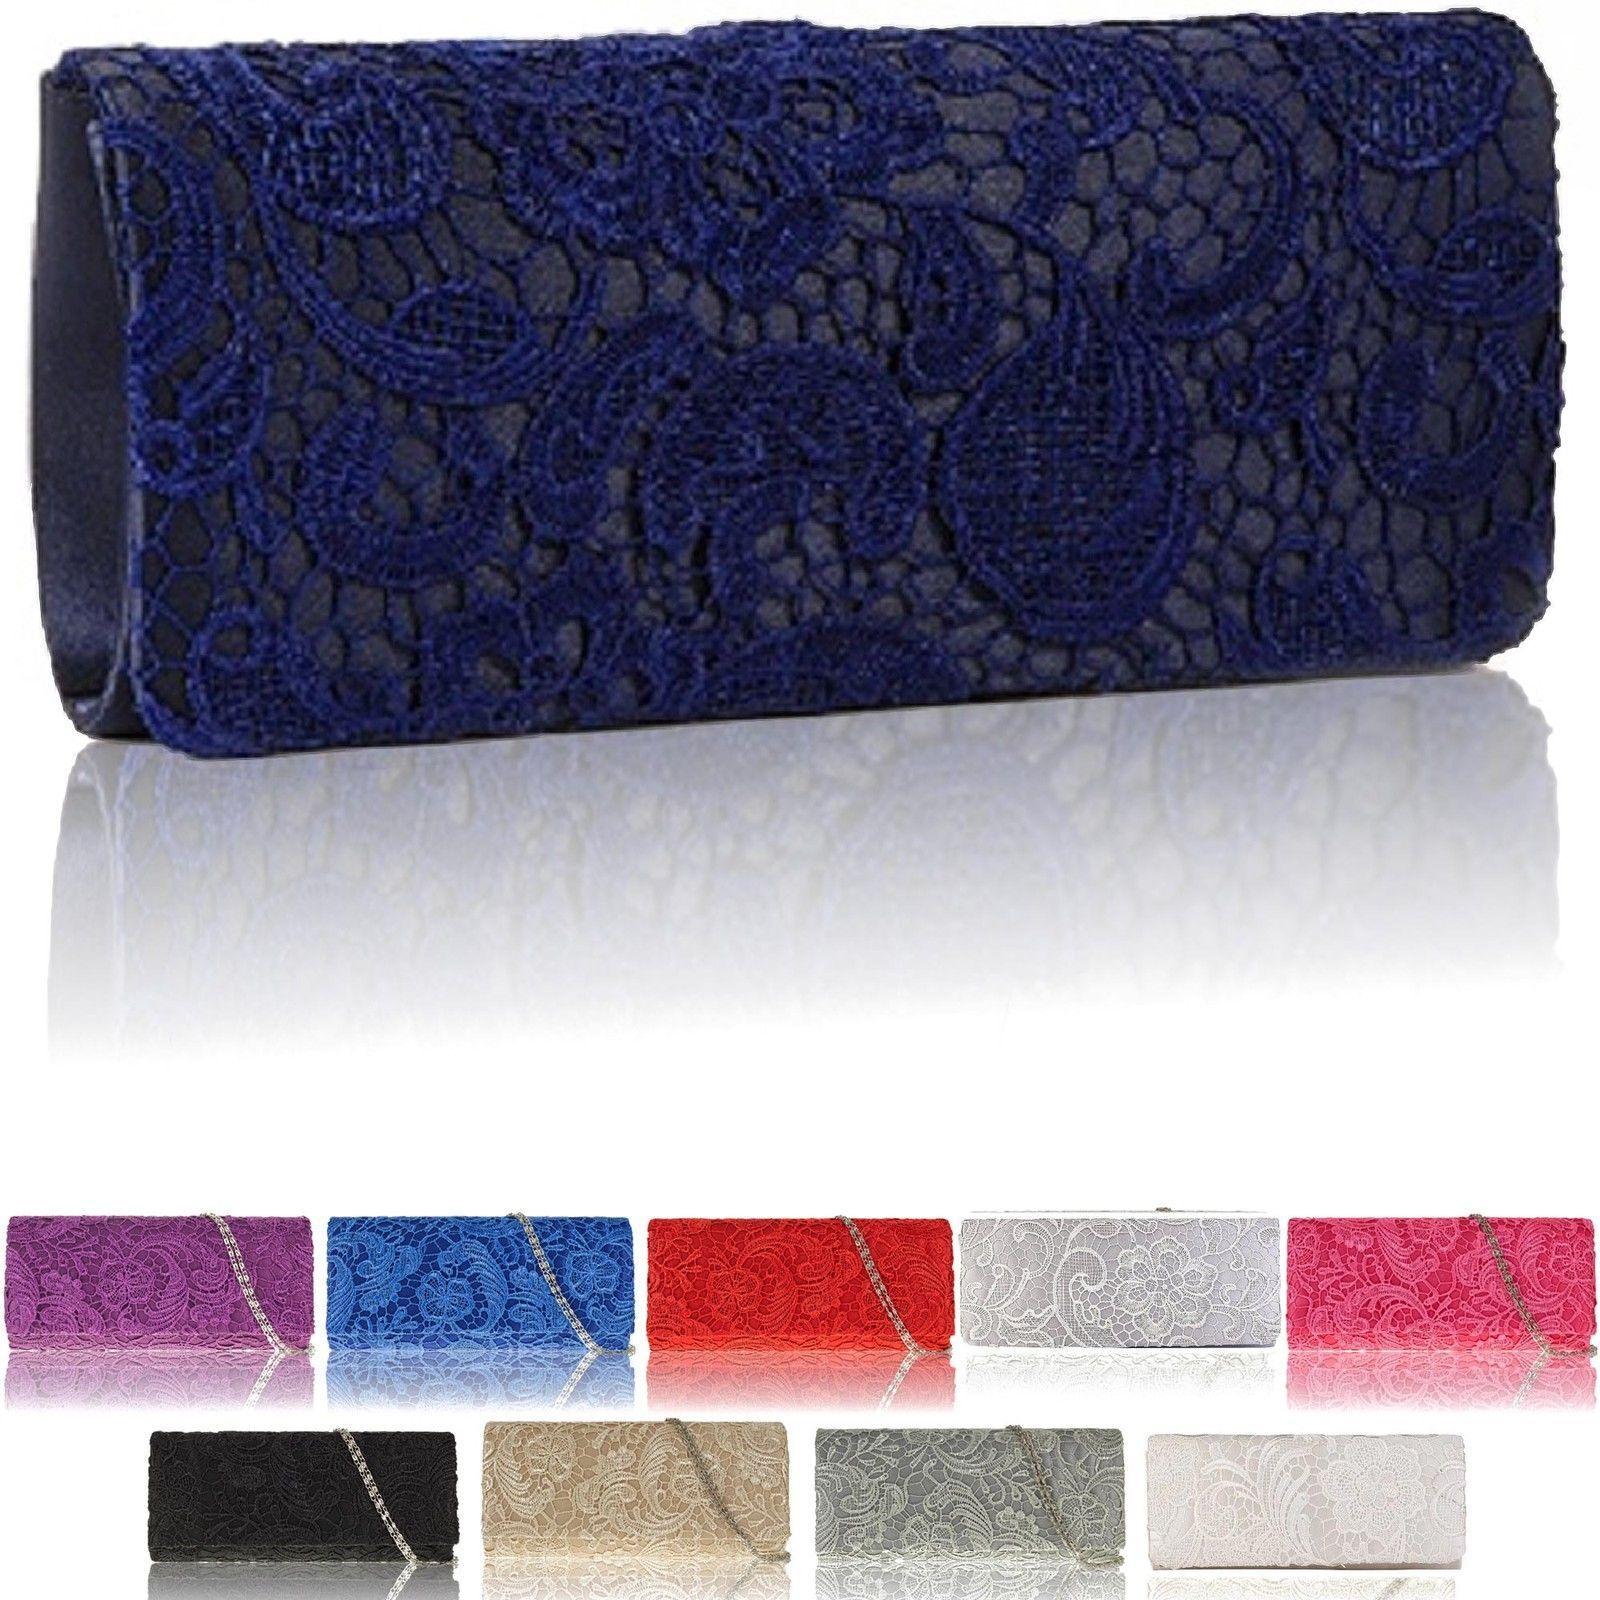 Satin Floral Lace Women's Clutch Bag Purse or Evenings party Bag